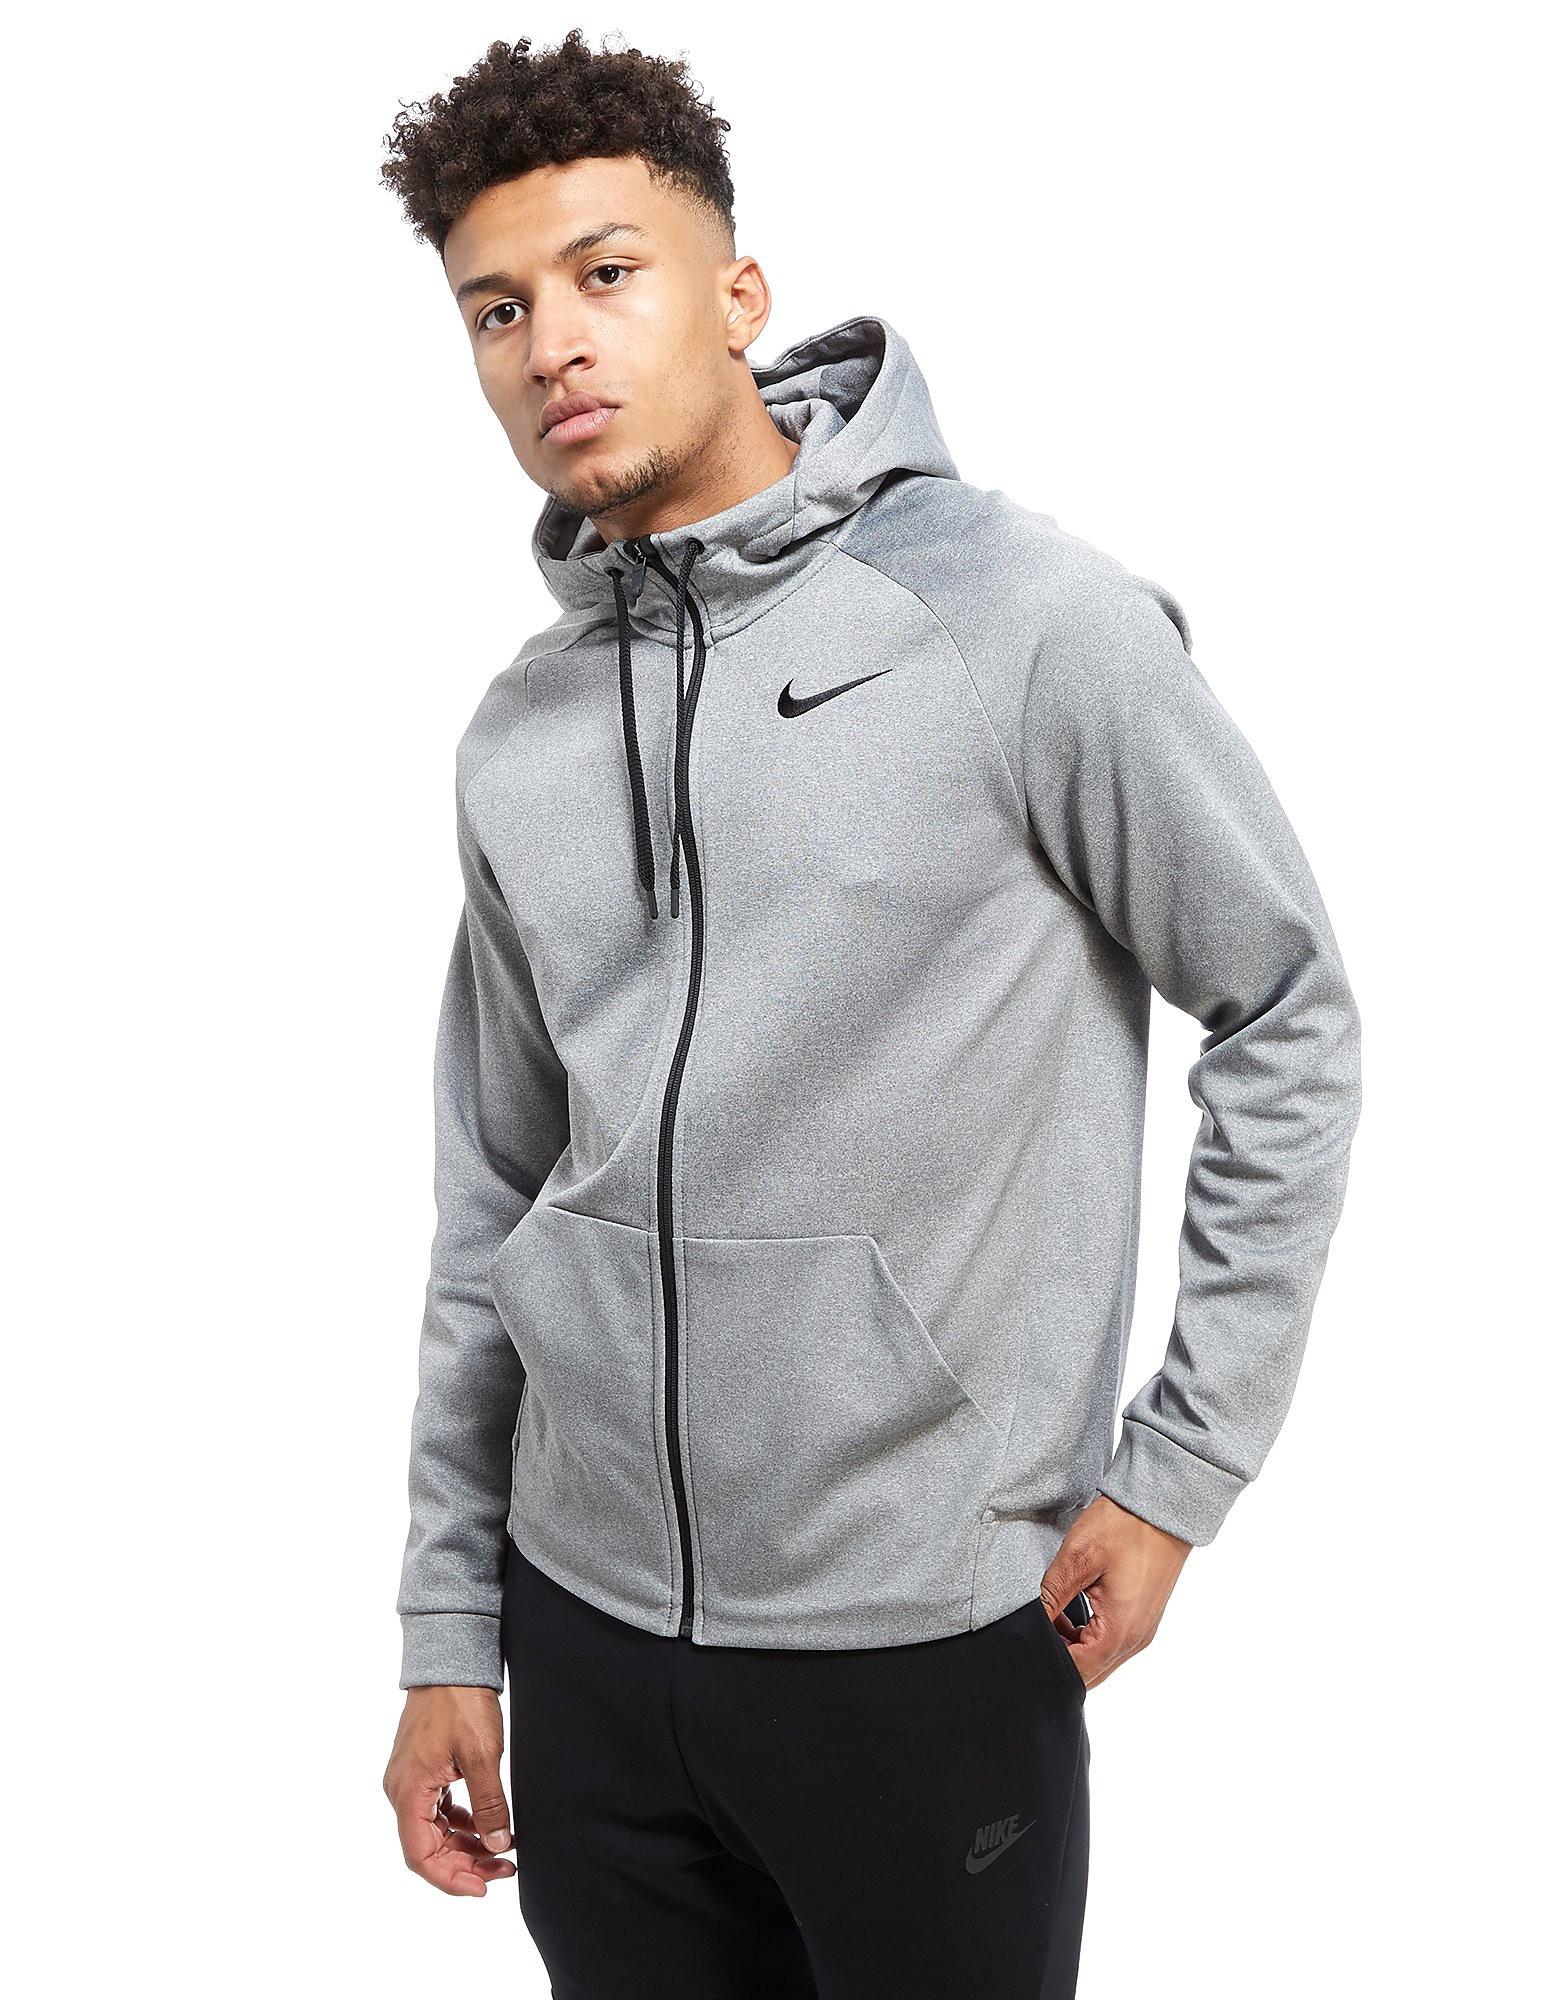 Nike Train Full Zip Hoody